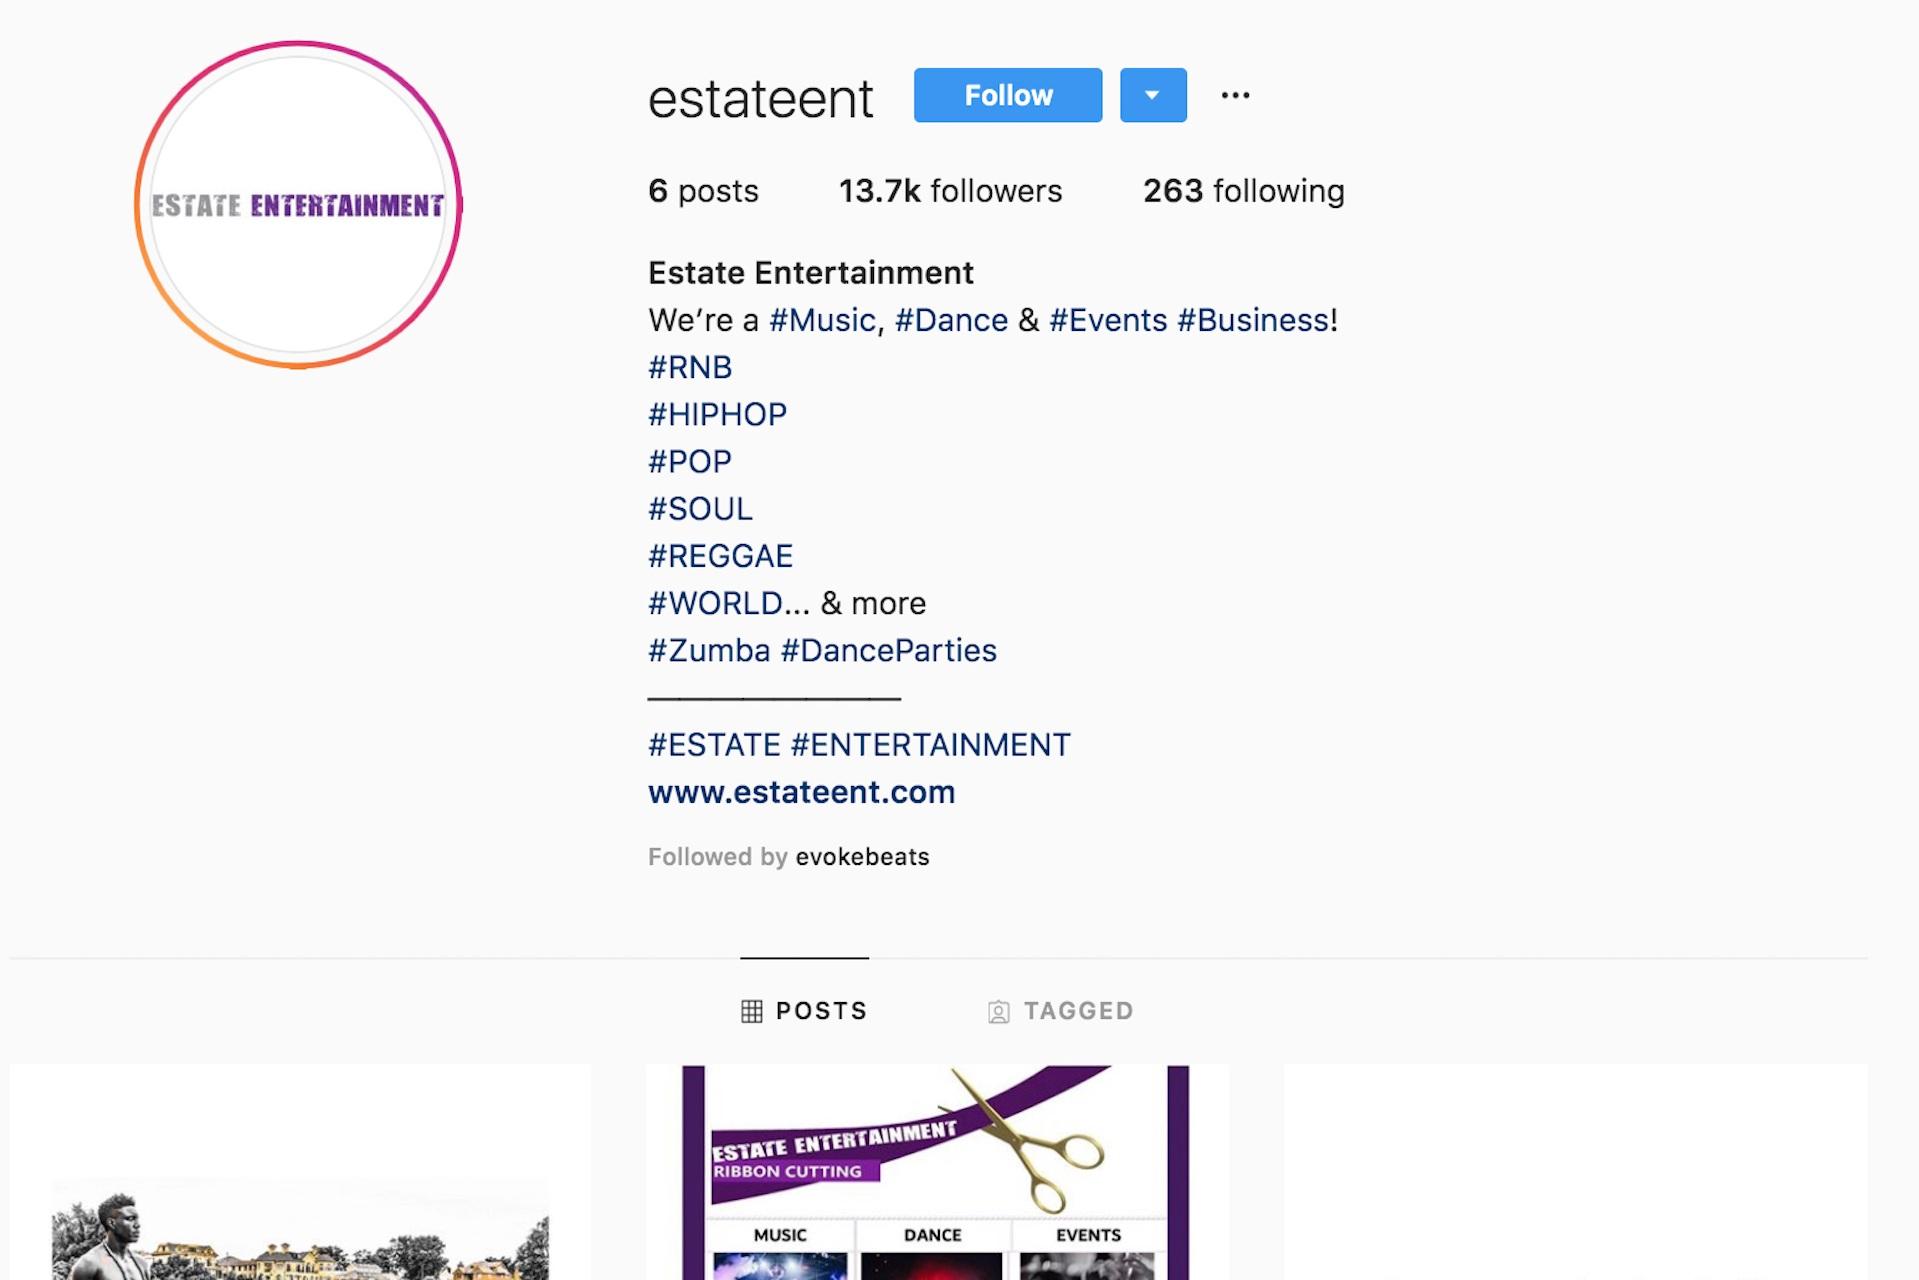 instagram.com/estateent